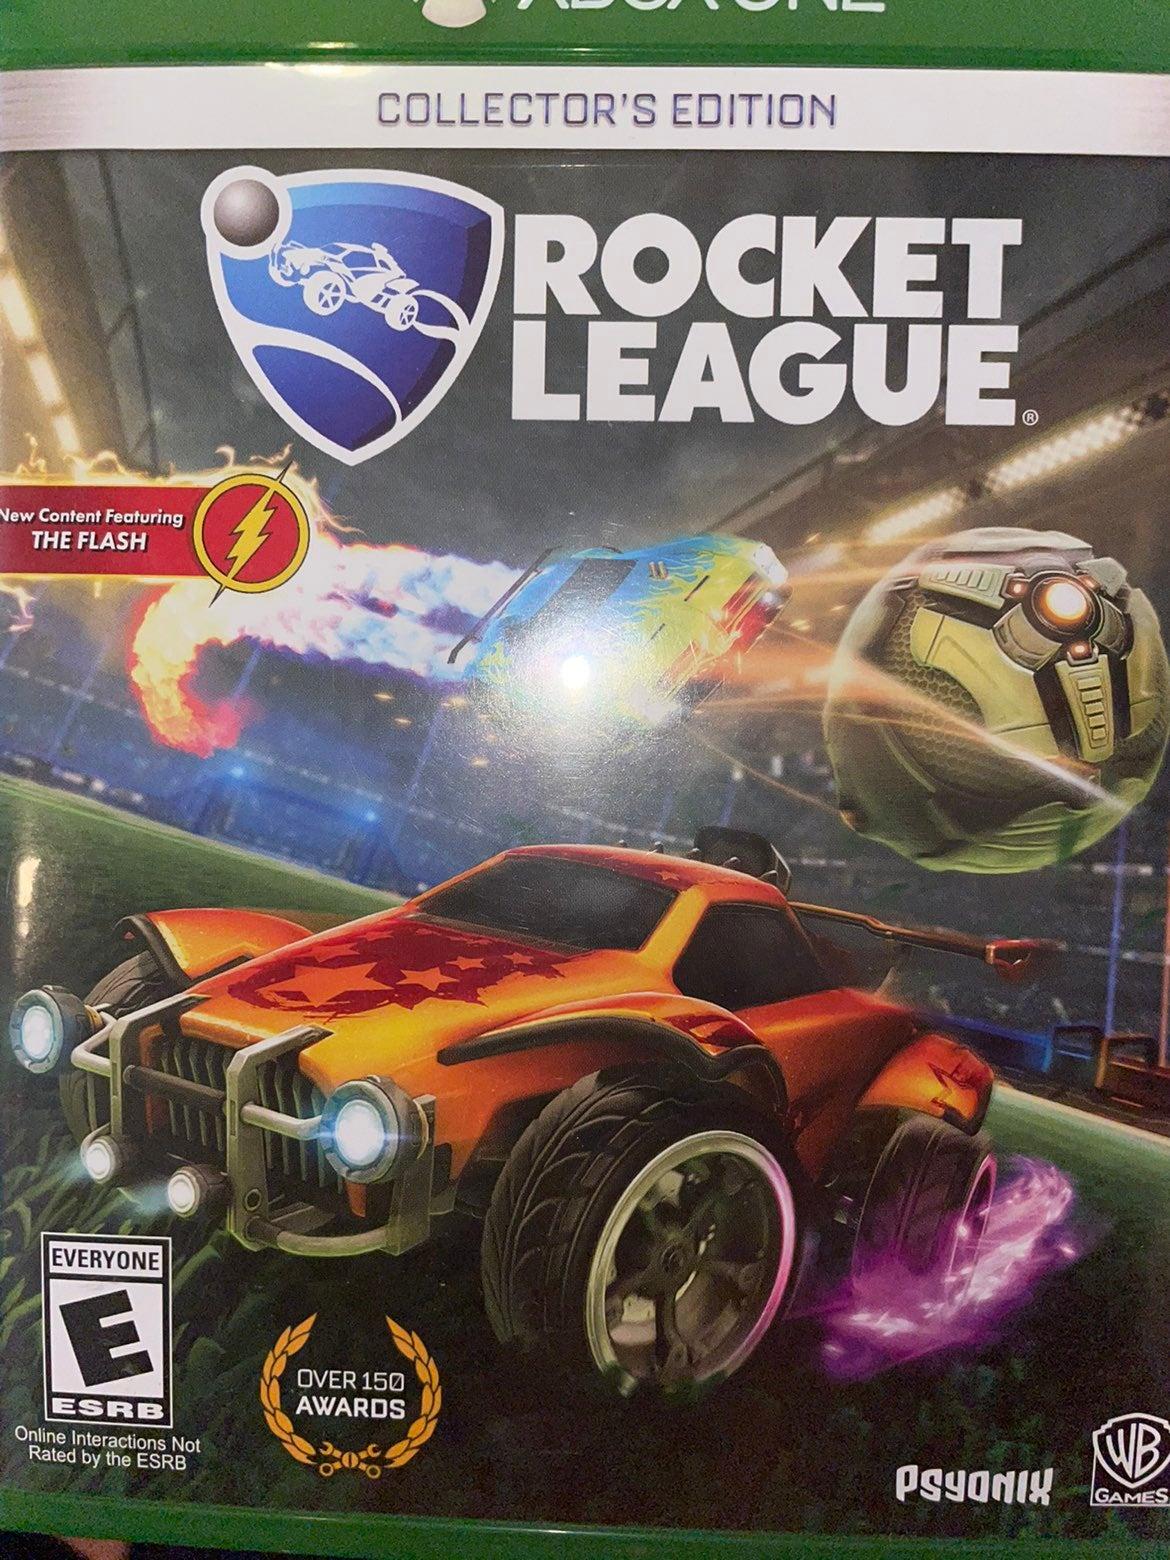 Rocket League on Xbox One